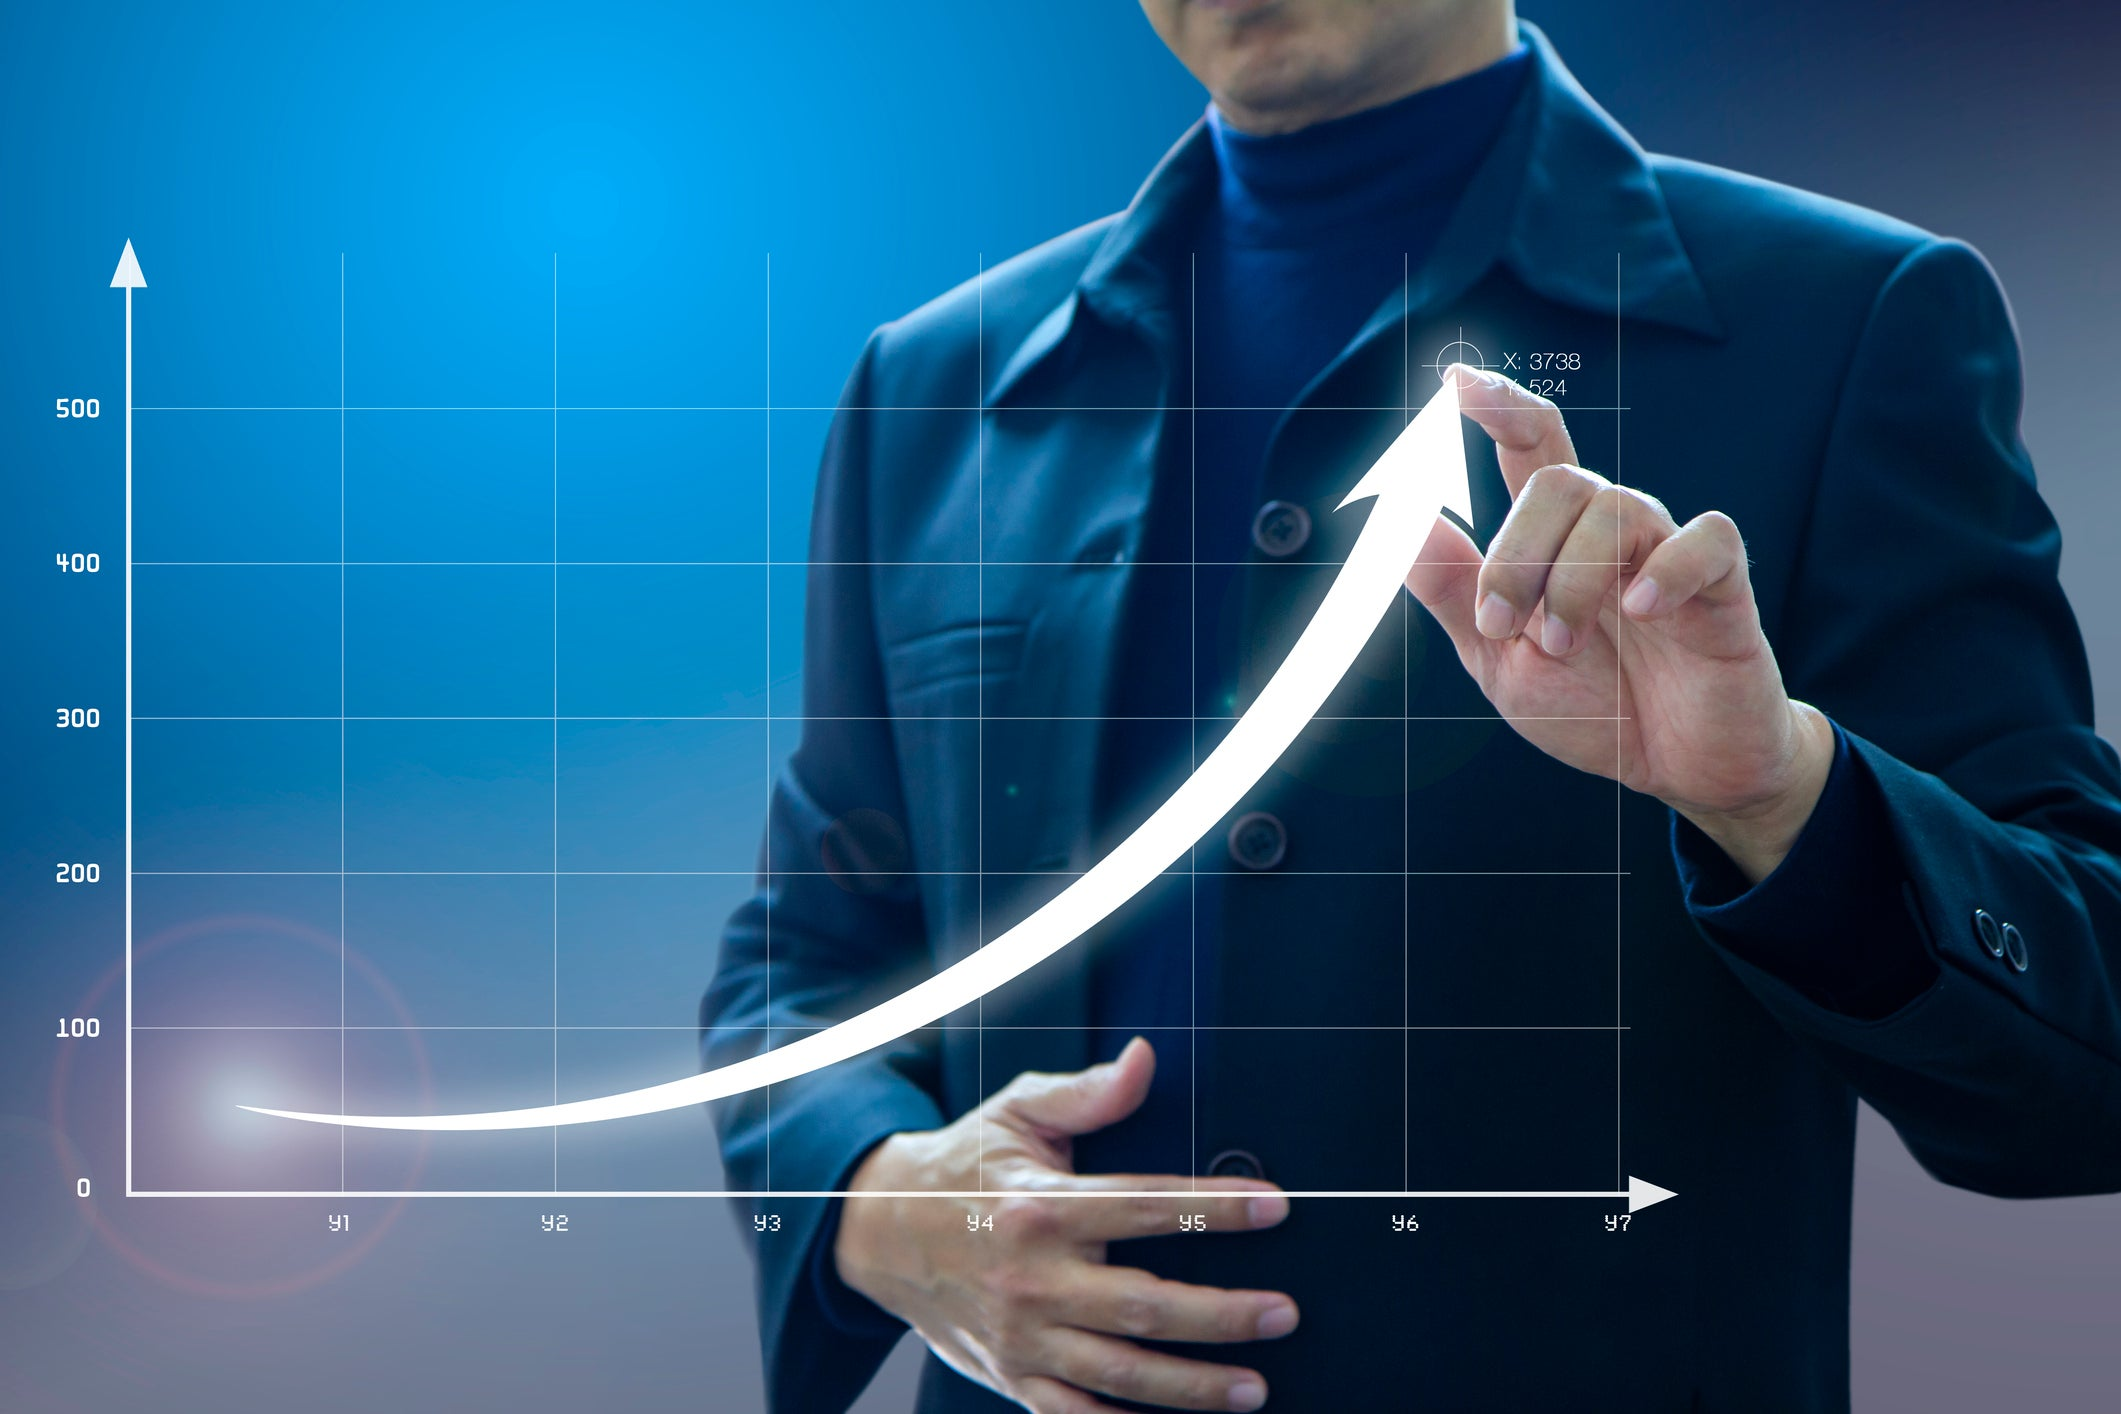 Ebang International Stock Rises Sharply After Litecoin and Dogecoin Announcement